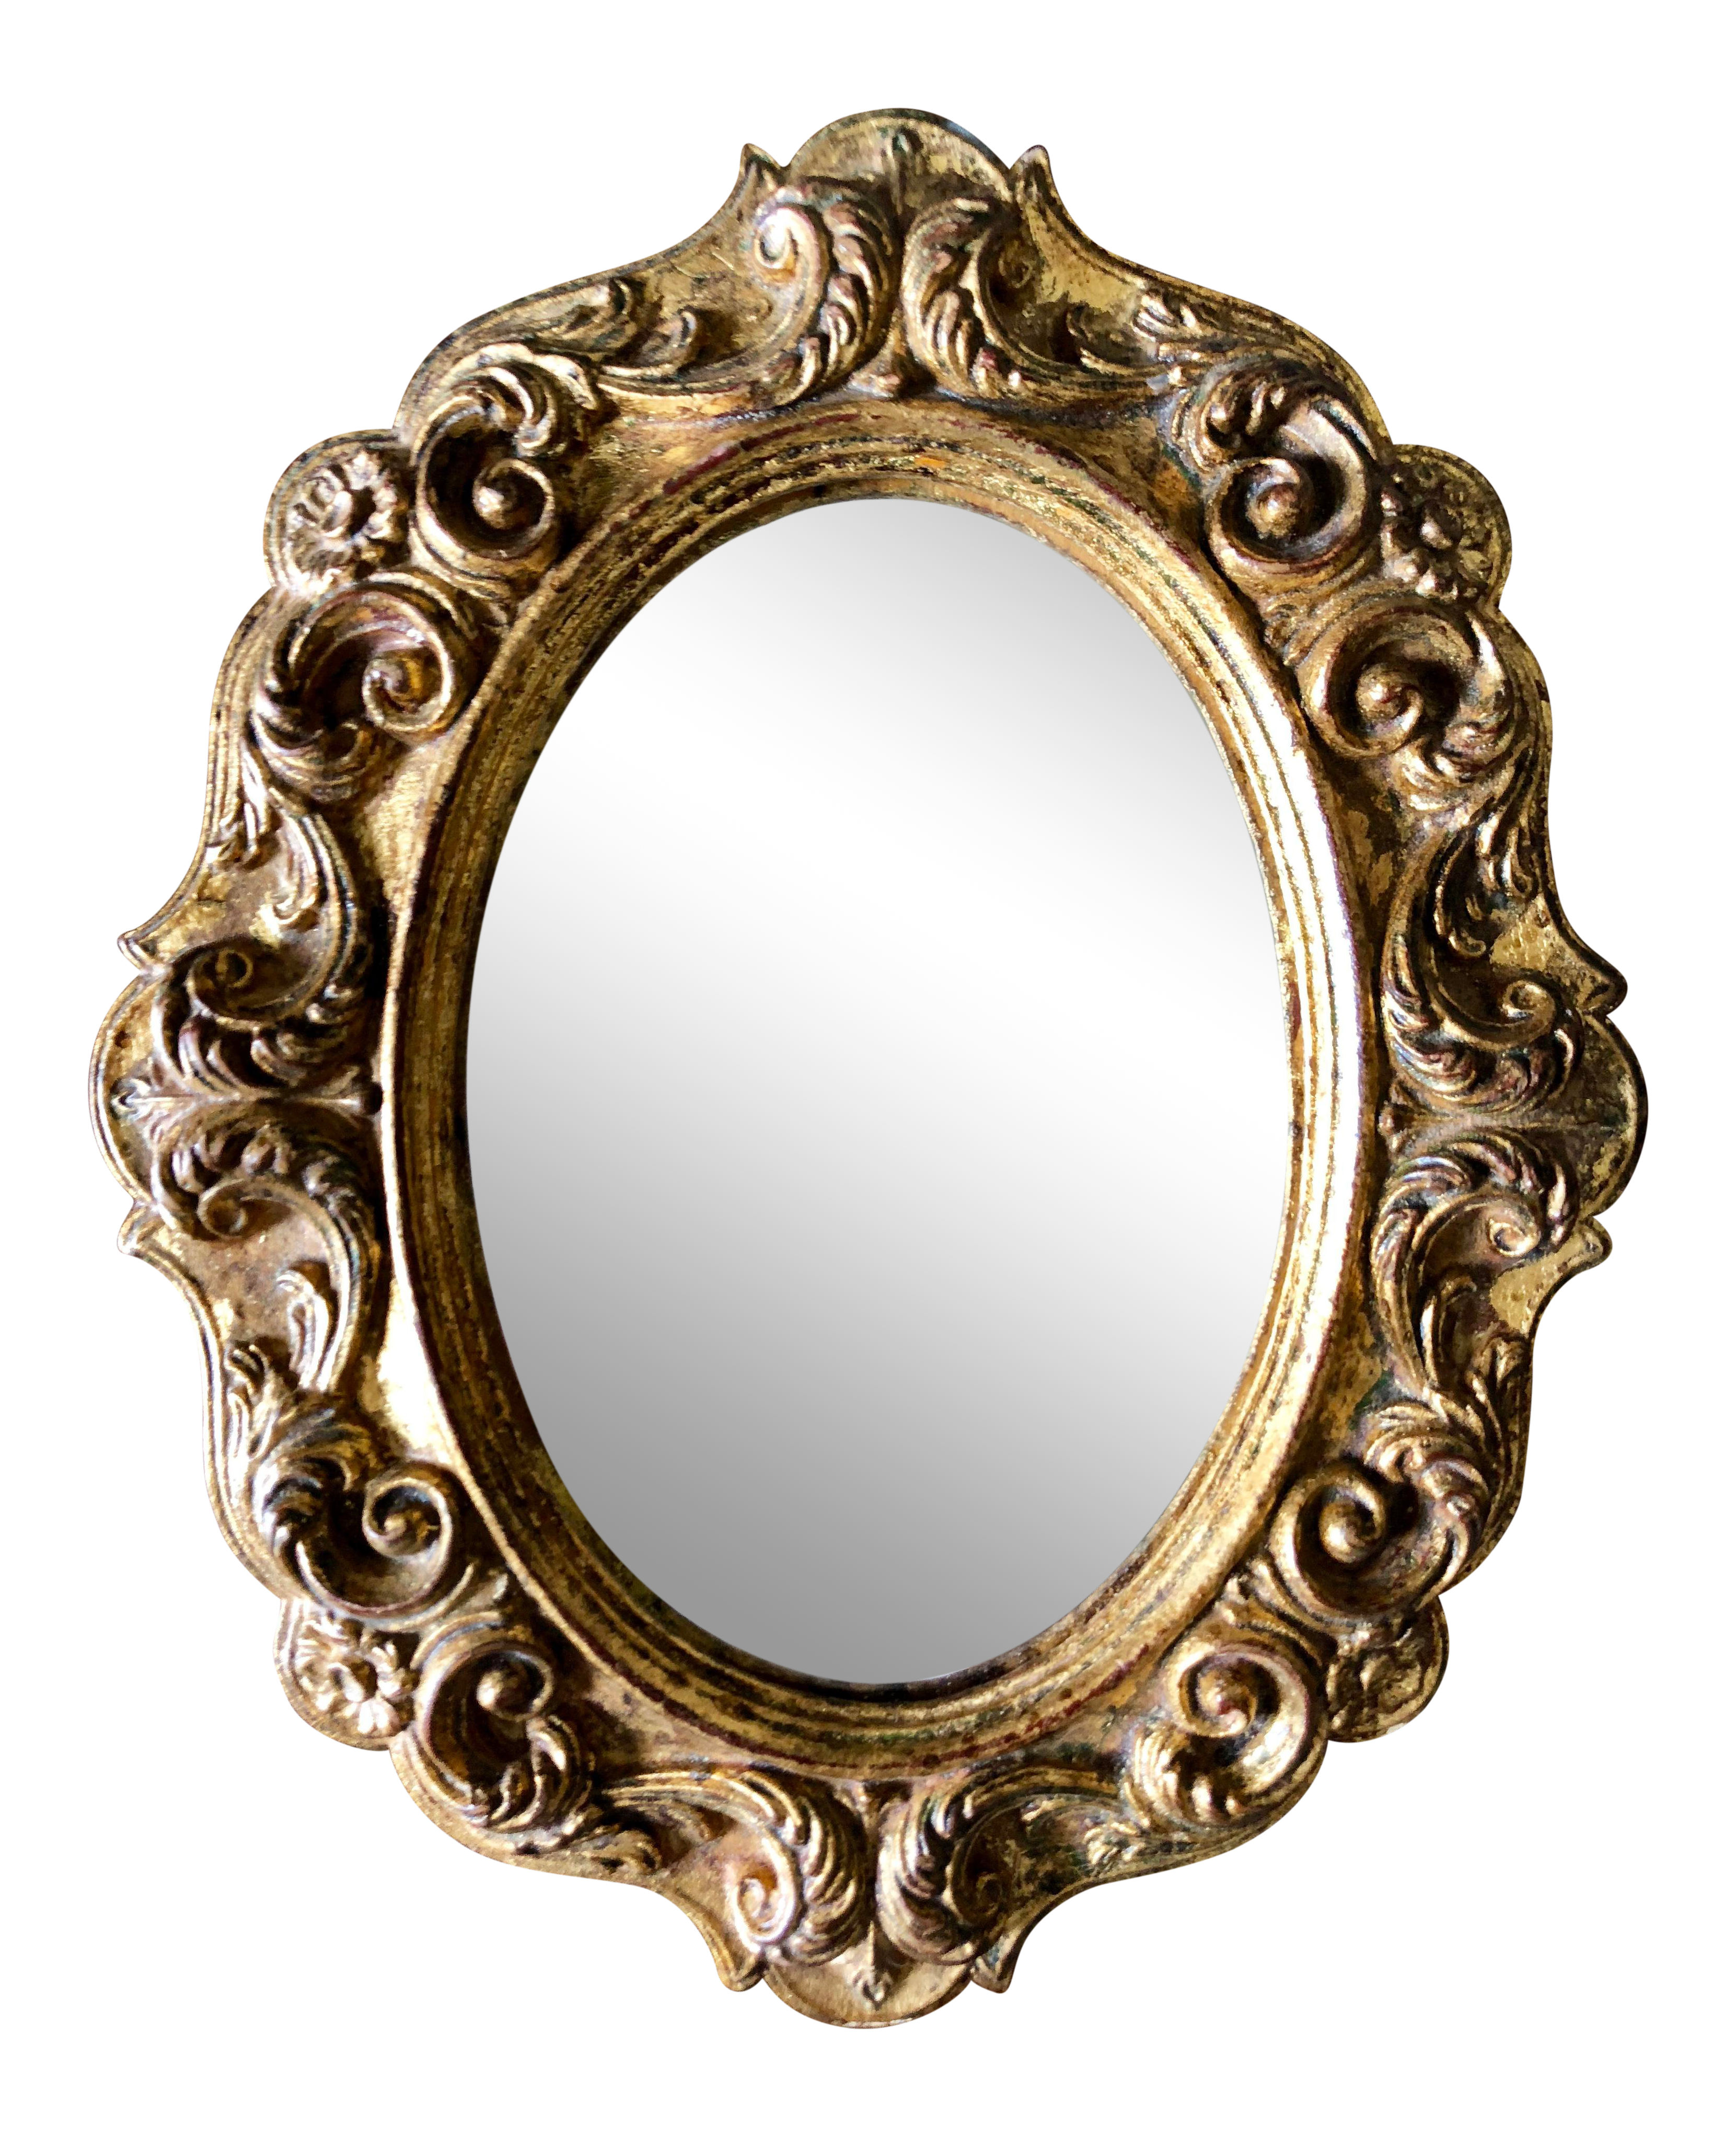 Vintage Oval Florentine Gilt Mirror.